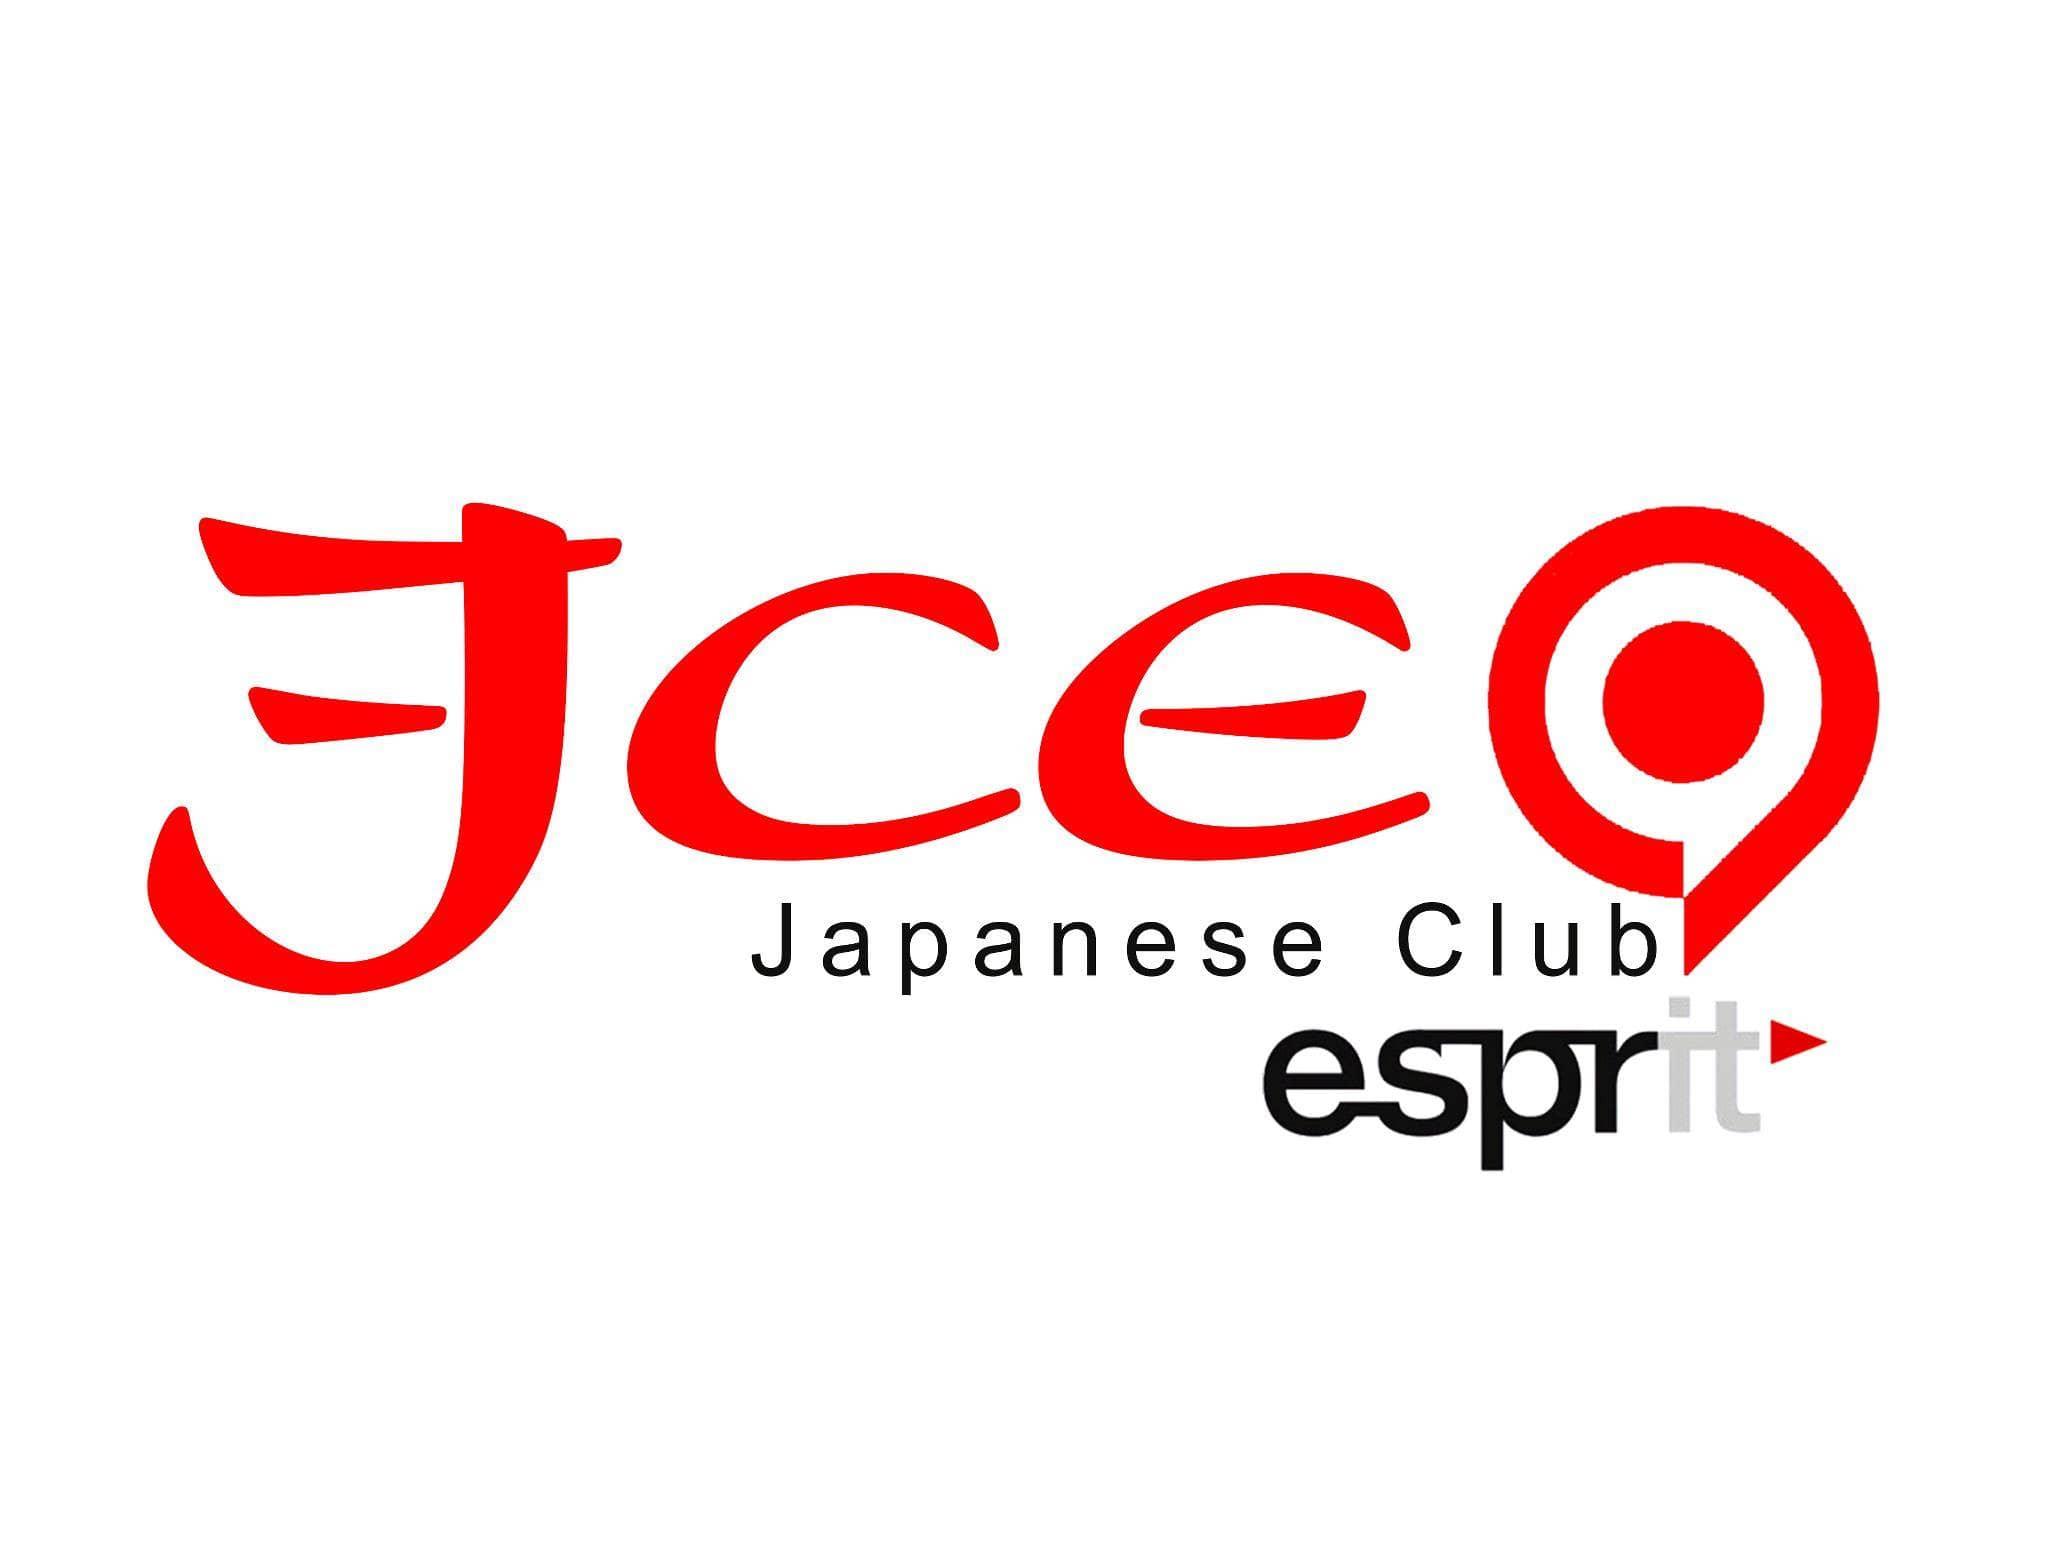 Japanese Club of Esprit (JCE)